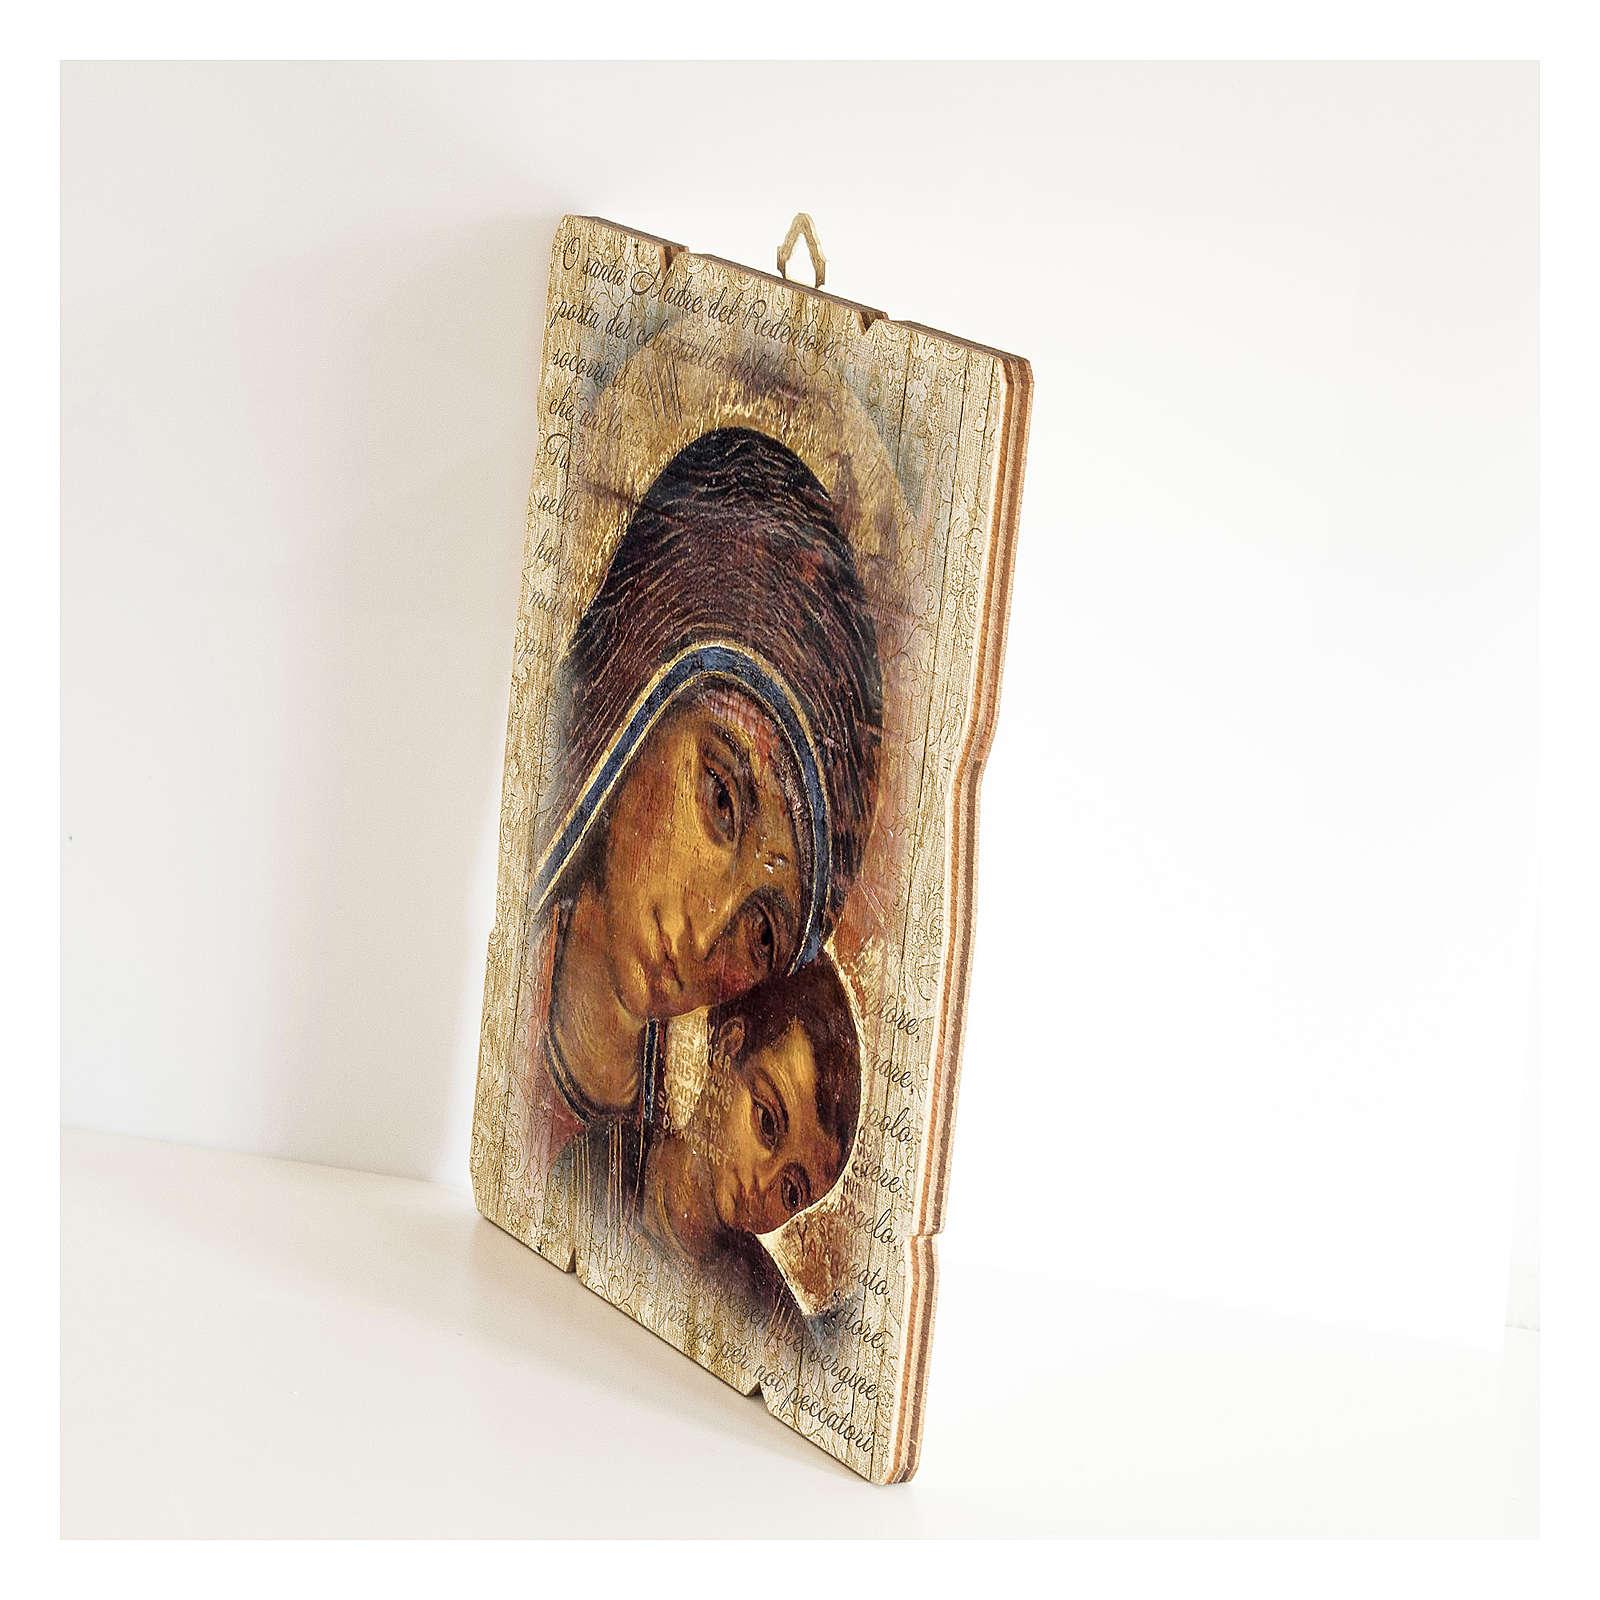 Calendrier Kiko.Tableau Bois Profile Avec Crochet Icone Vierge De Kiko